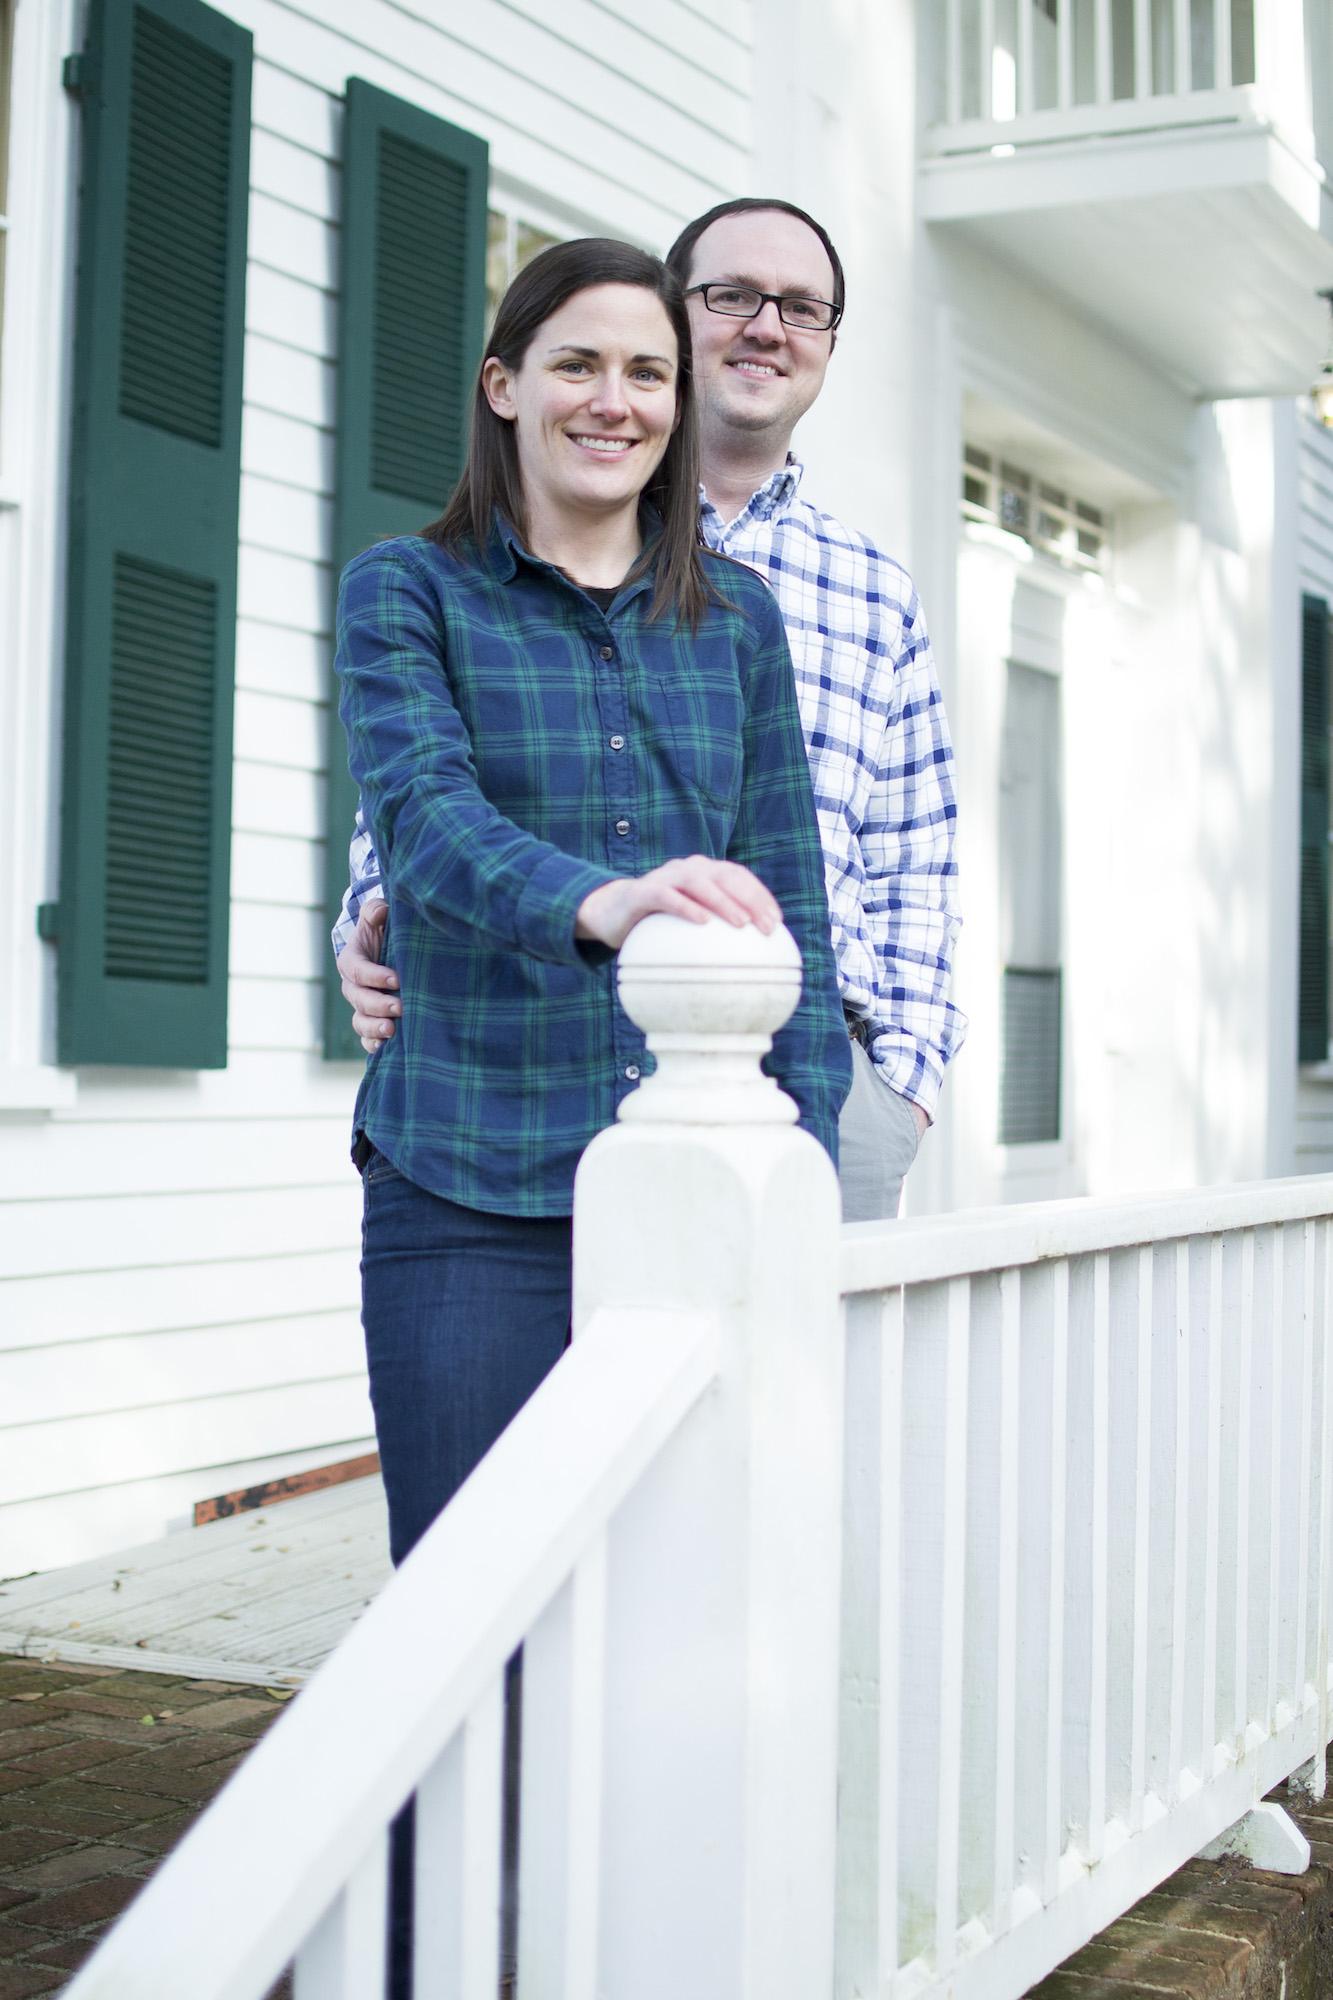 faulkner house engagement photos.jpg